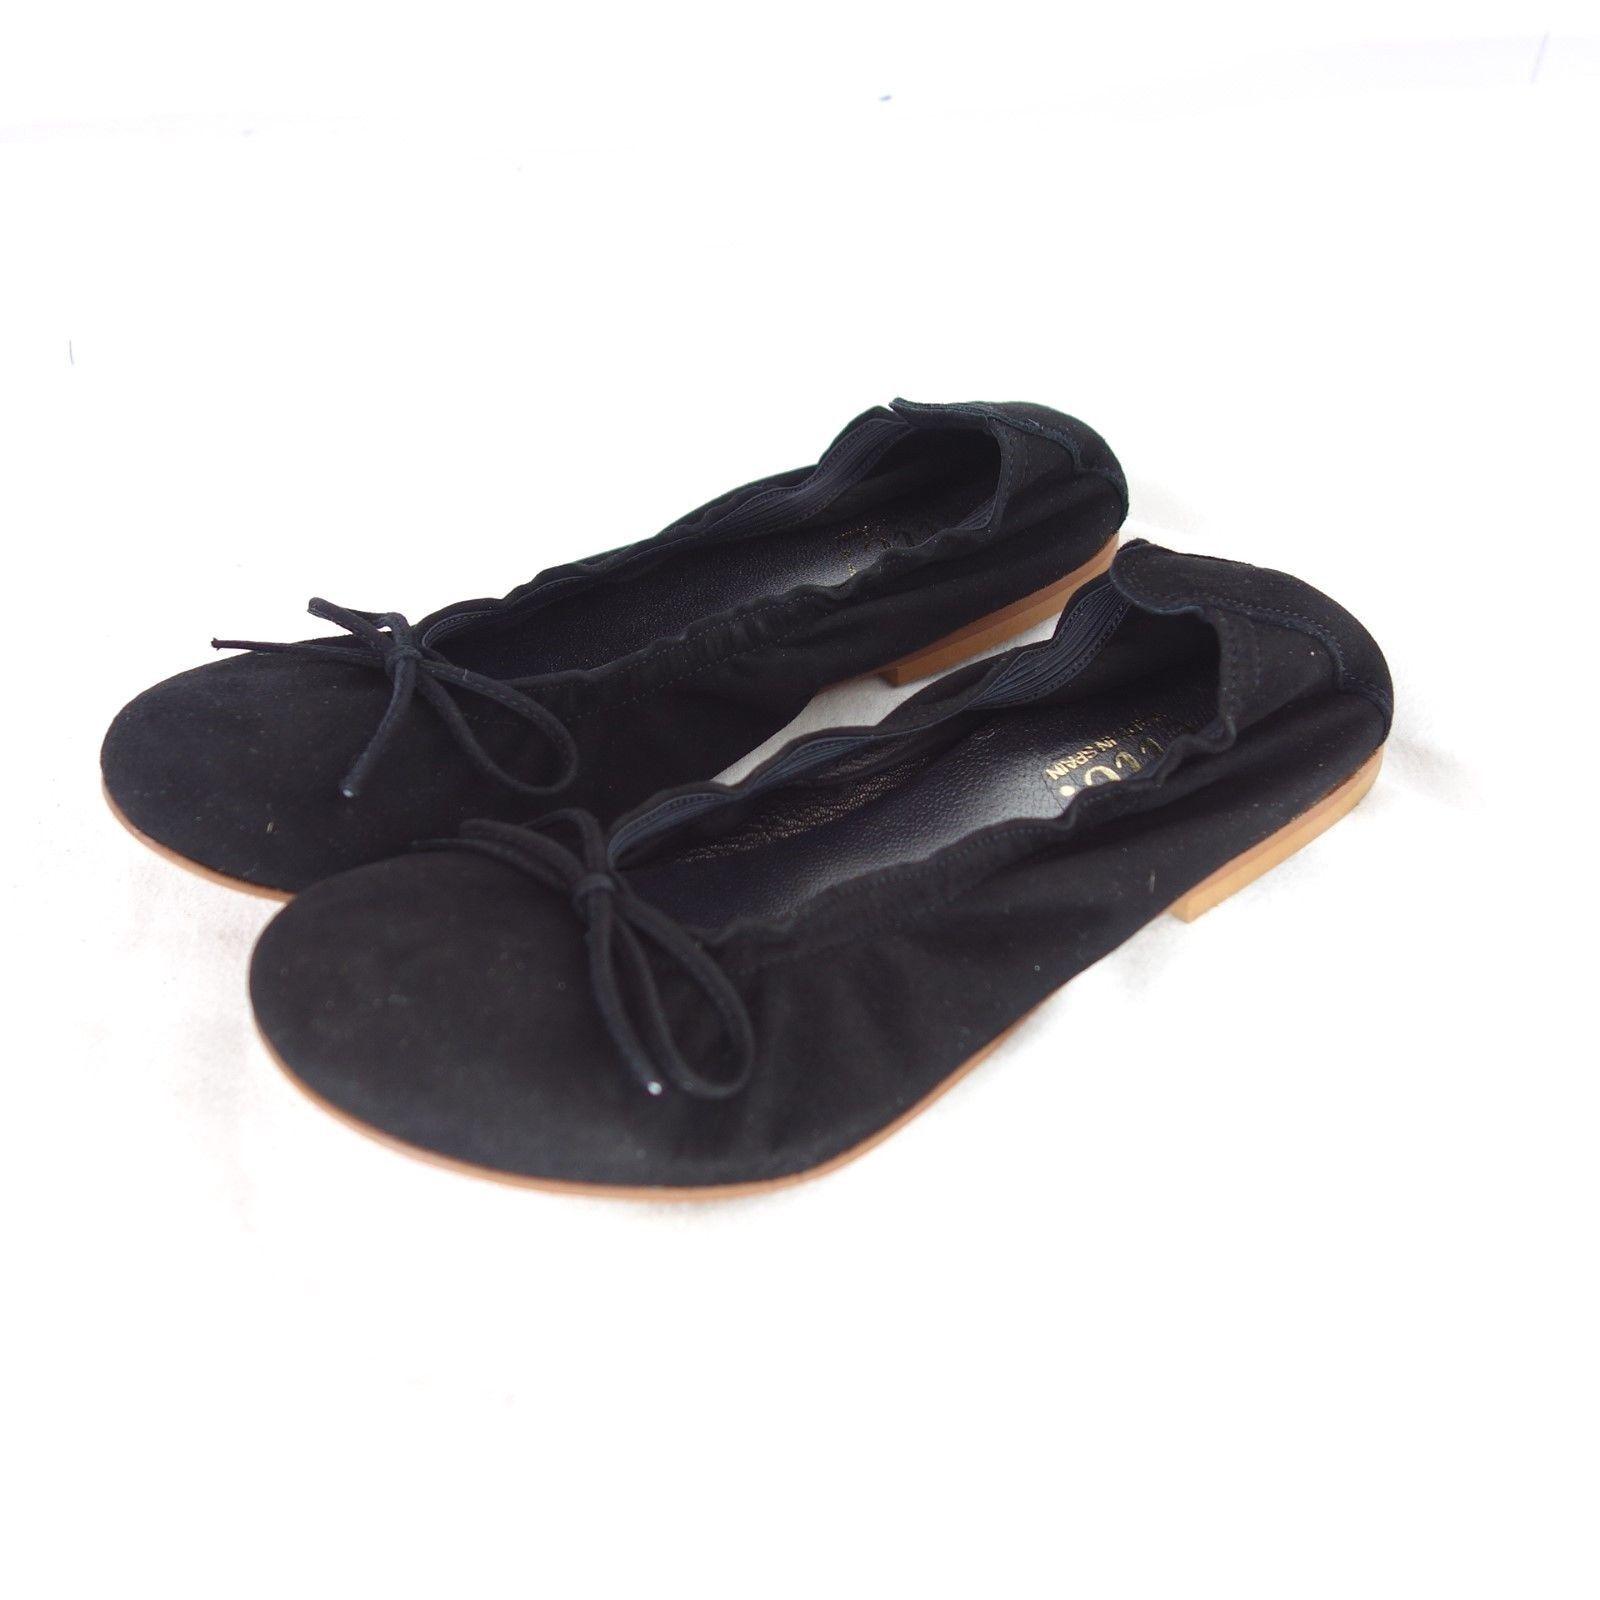 Clic  Damen Schuhe Ballerinas Gr 35 Sandalen Leder Wildleder Schwarz NP 79 NEU